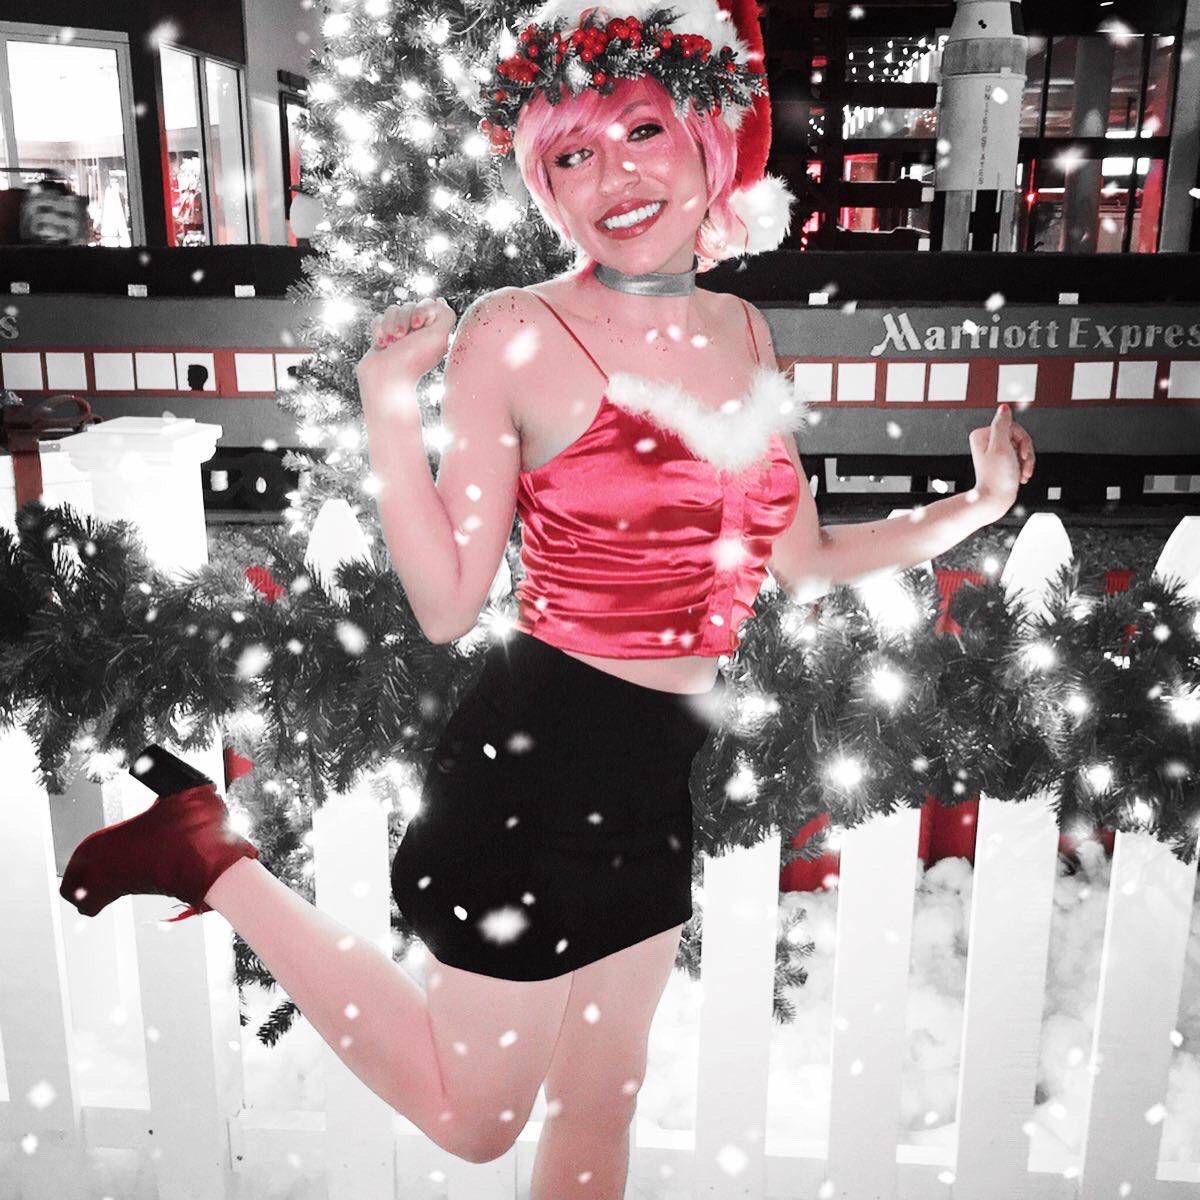 adorable new character to me persephone from the webcomic lore olympus . . . . . . .#holidaymatsuri #holmat #holidaymatsuri2019 #loreolympus #persephone #holmat2019 #webtoon #webcomic #webtoons #cosplay #cosplayvixen #conlife #concrunch #mylifeisdopesoidodopeshitpic.twitter.com/LUlZVys7Ku